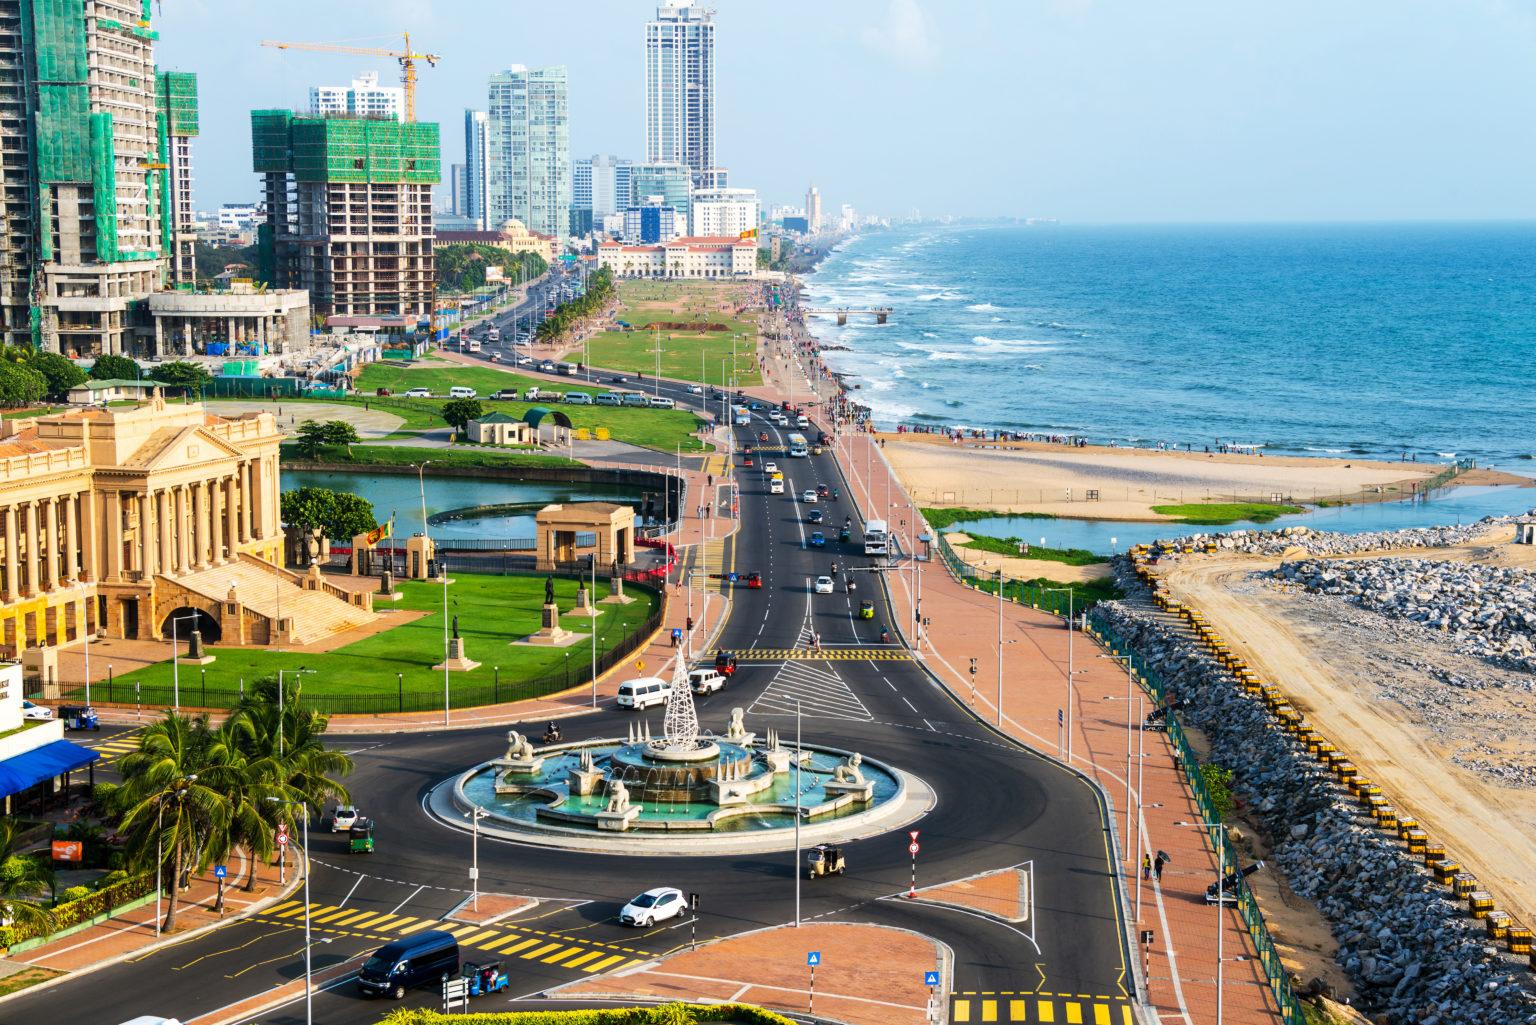 Walking tour in Colombo